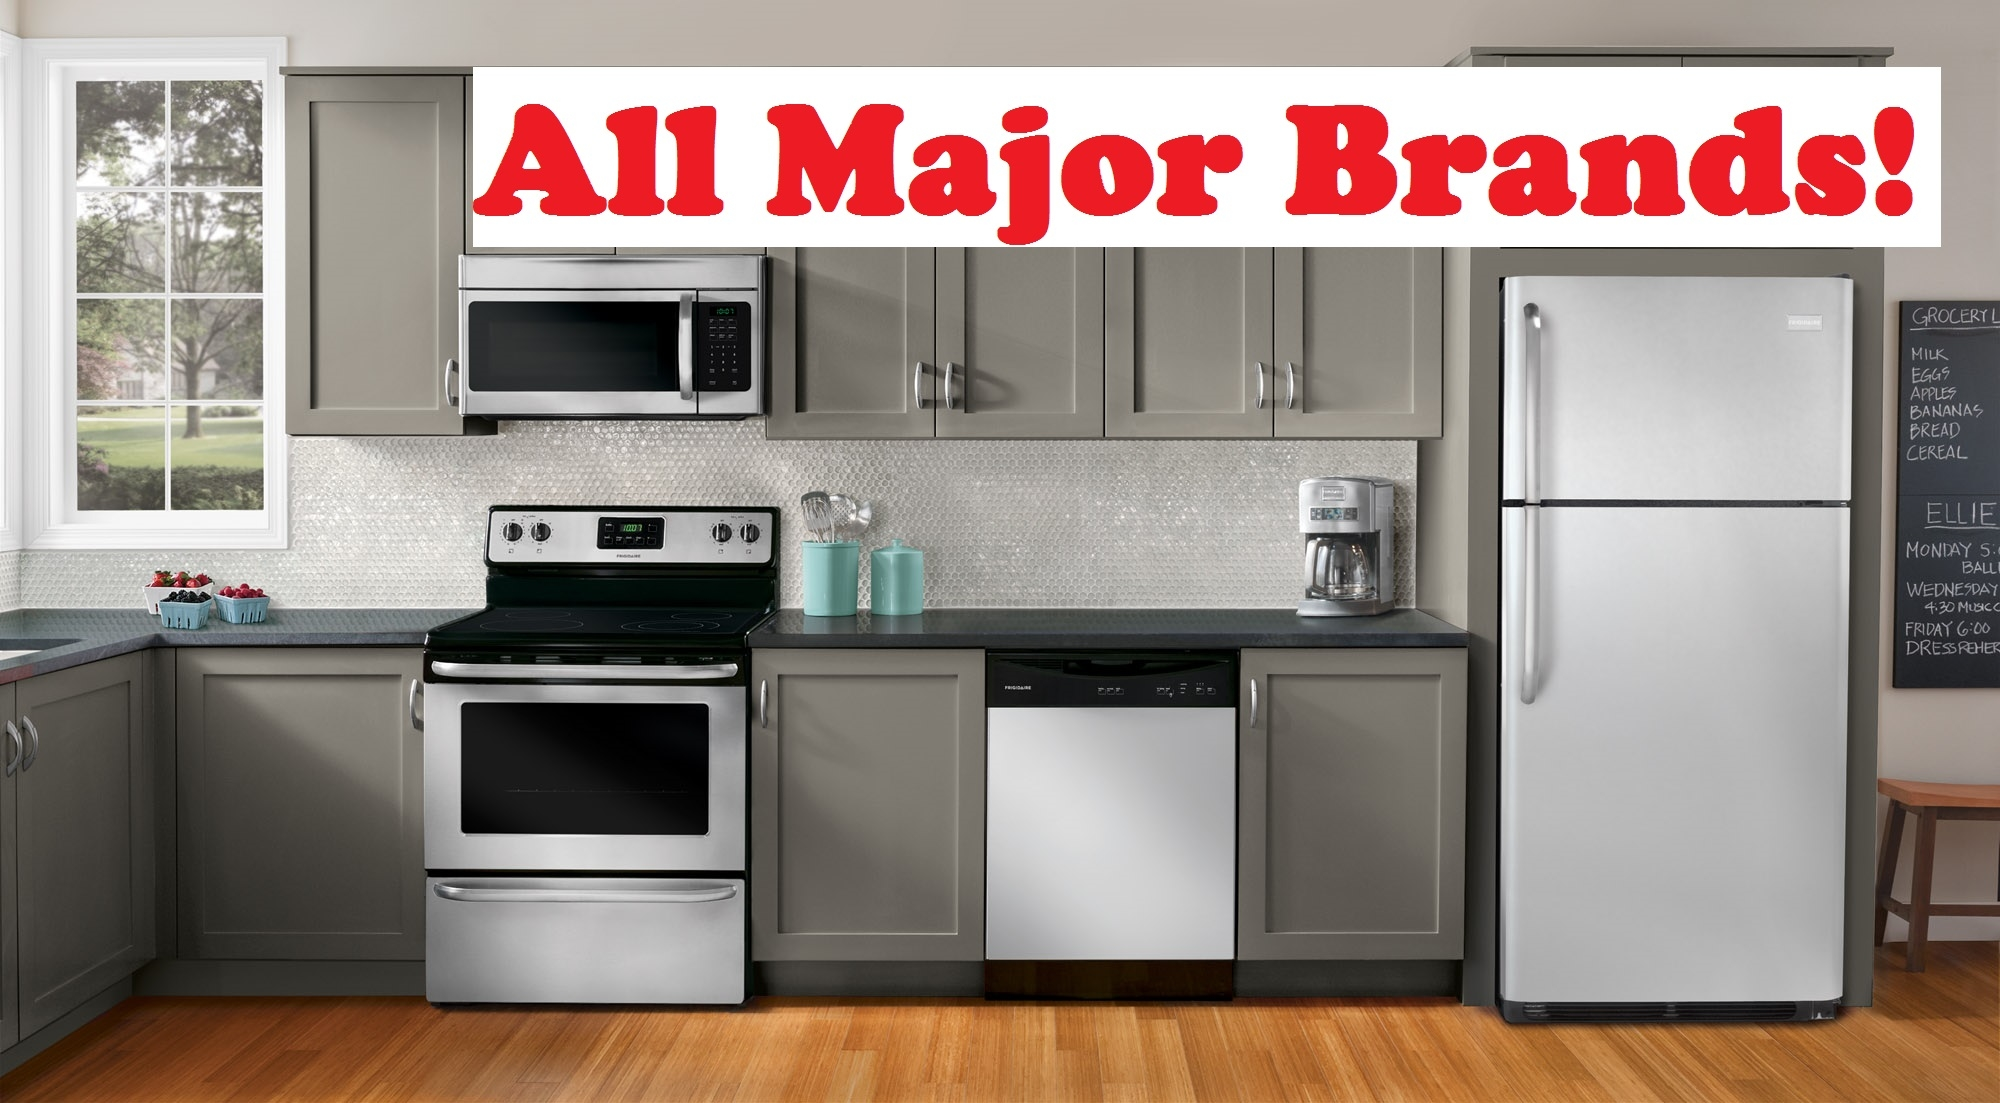 Max Global Long Beach Appliance Repair image 4